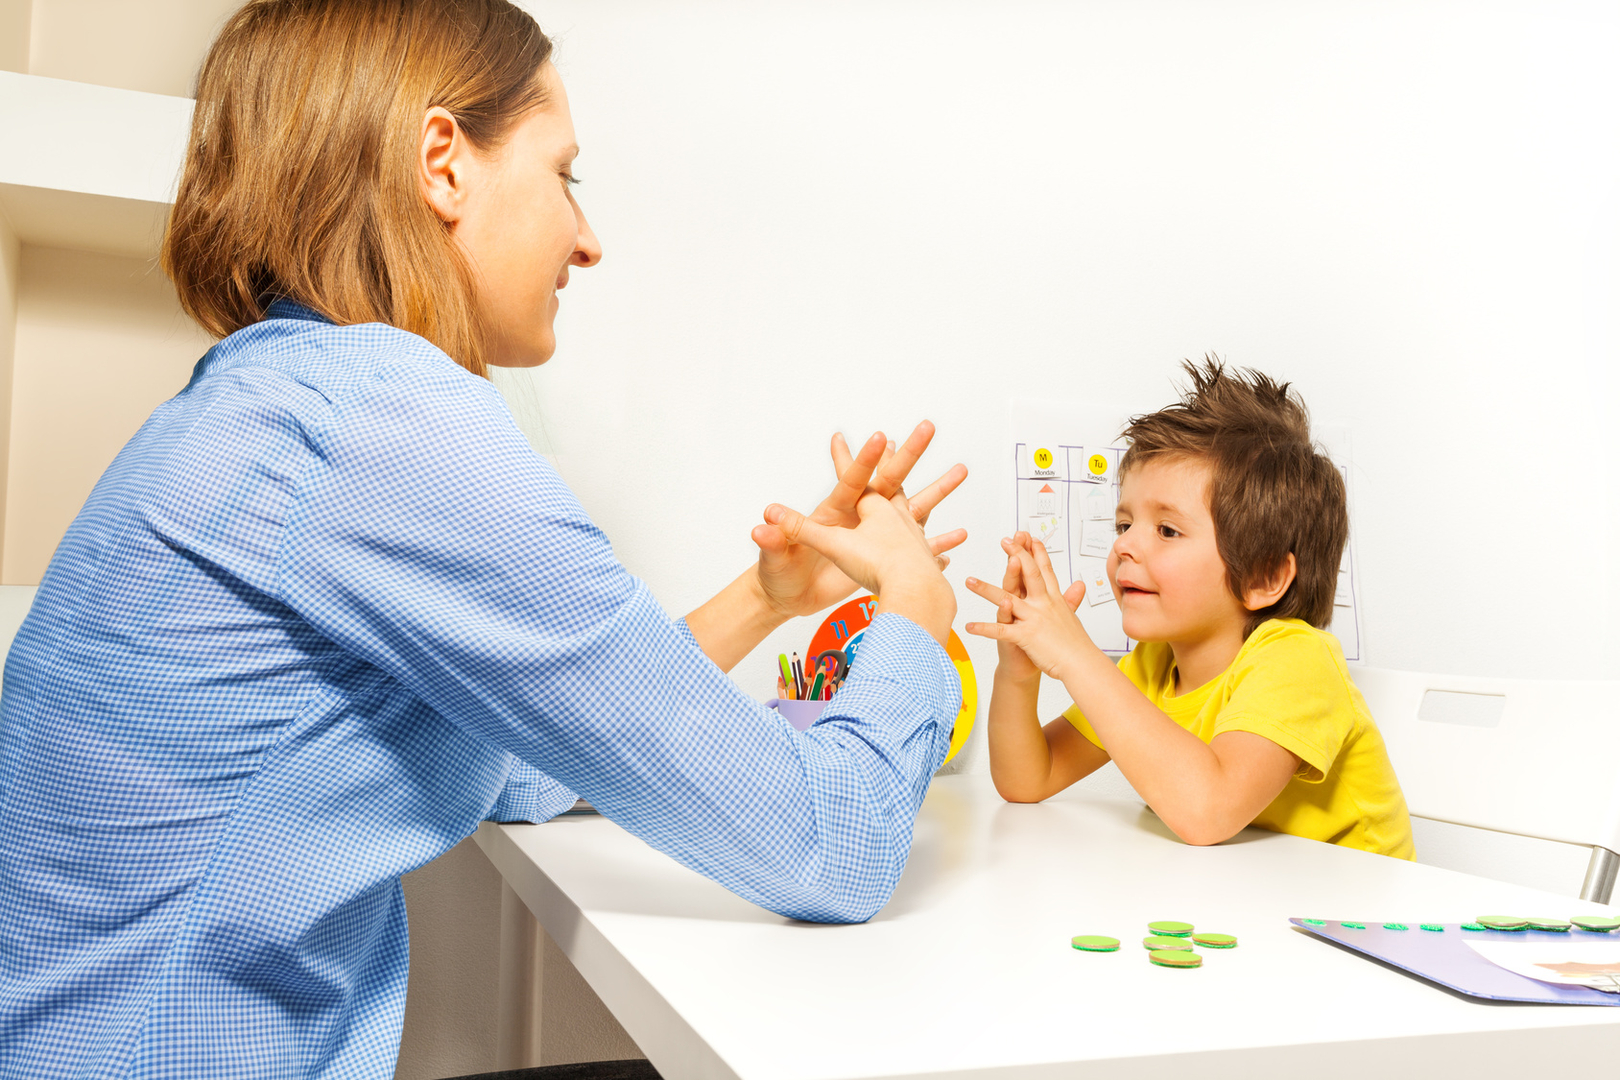 Картинки психолога и детей